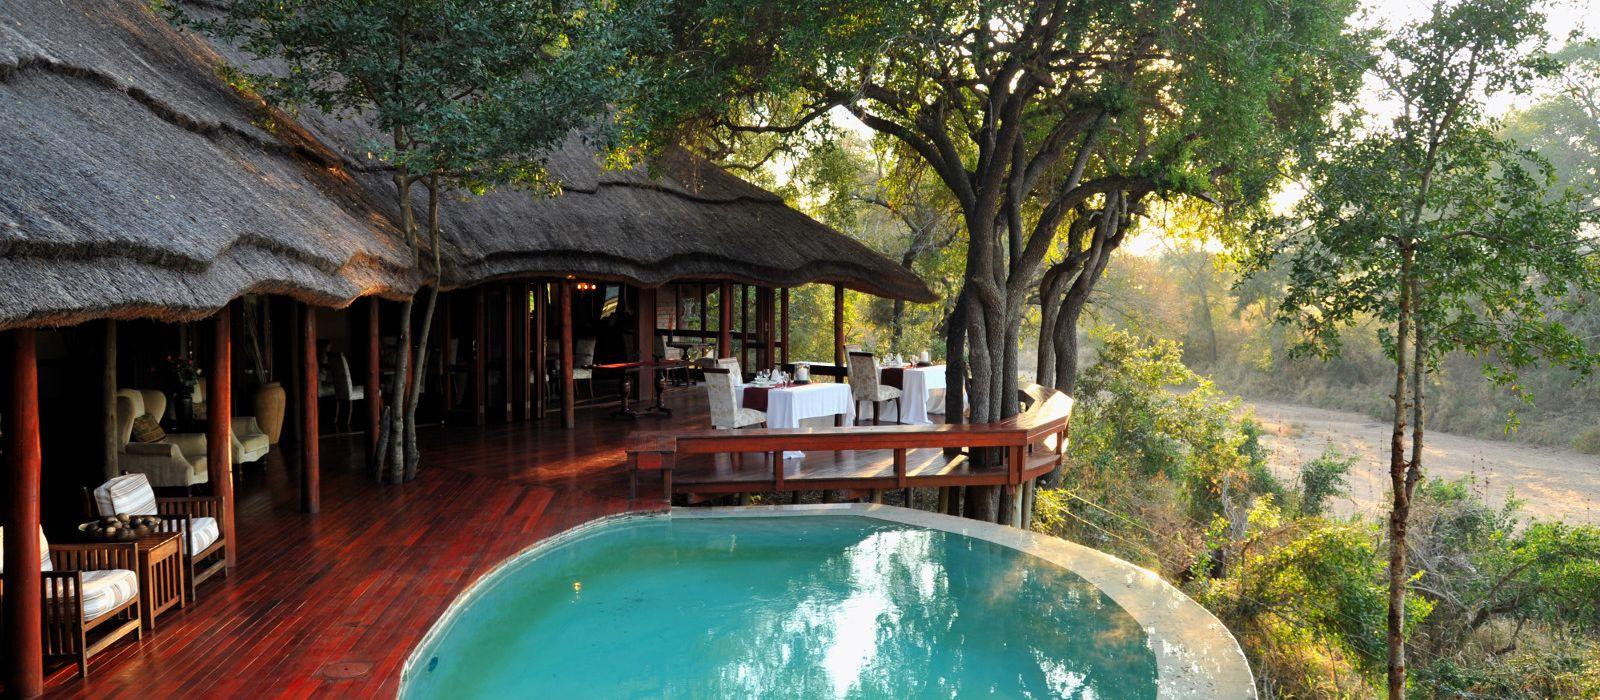 Hotel Imbali Safari Lodge South Africa